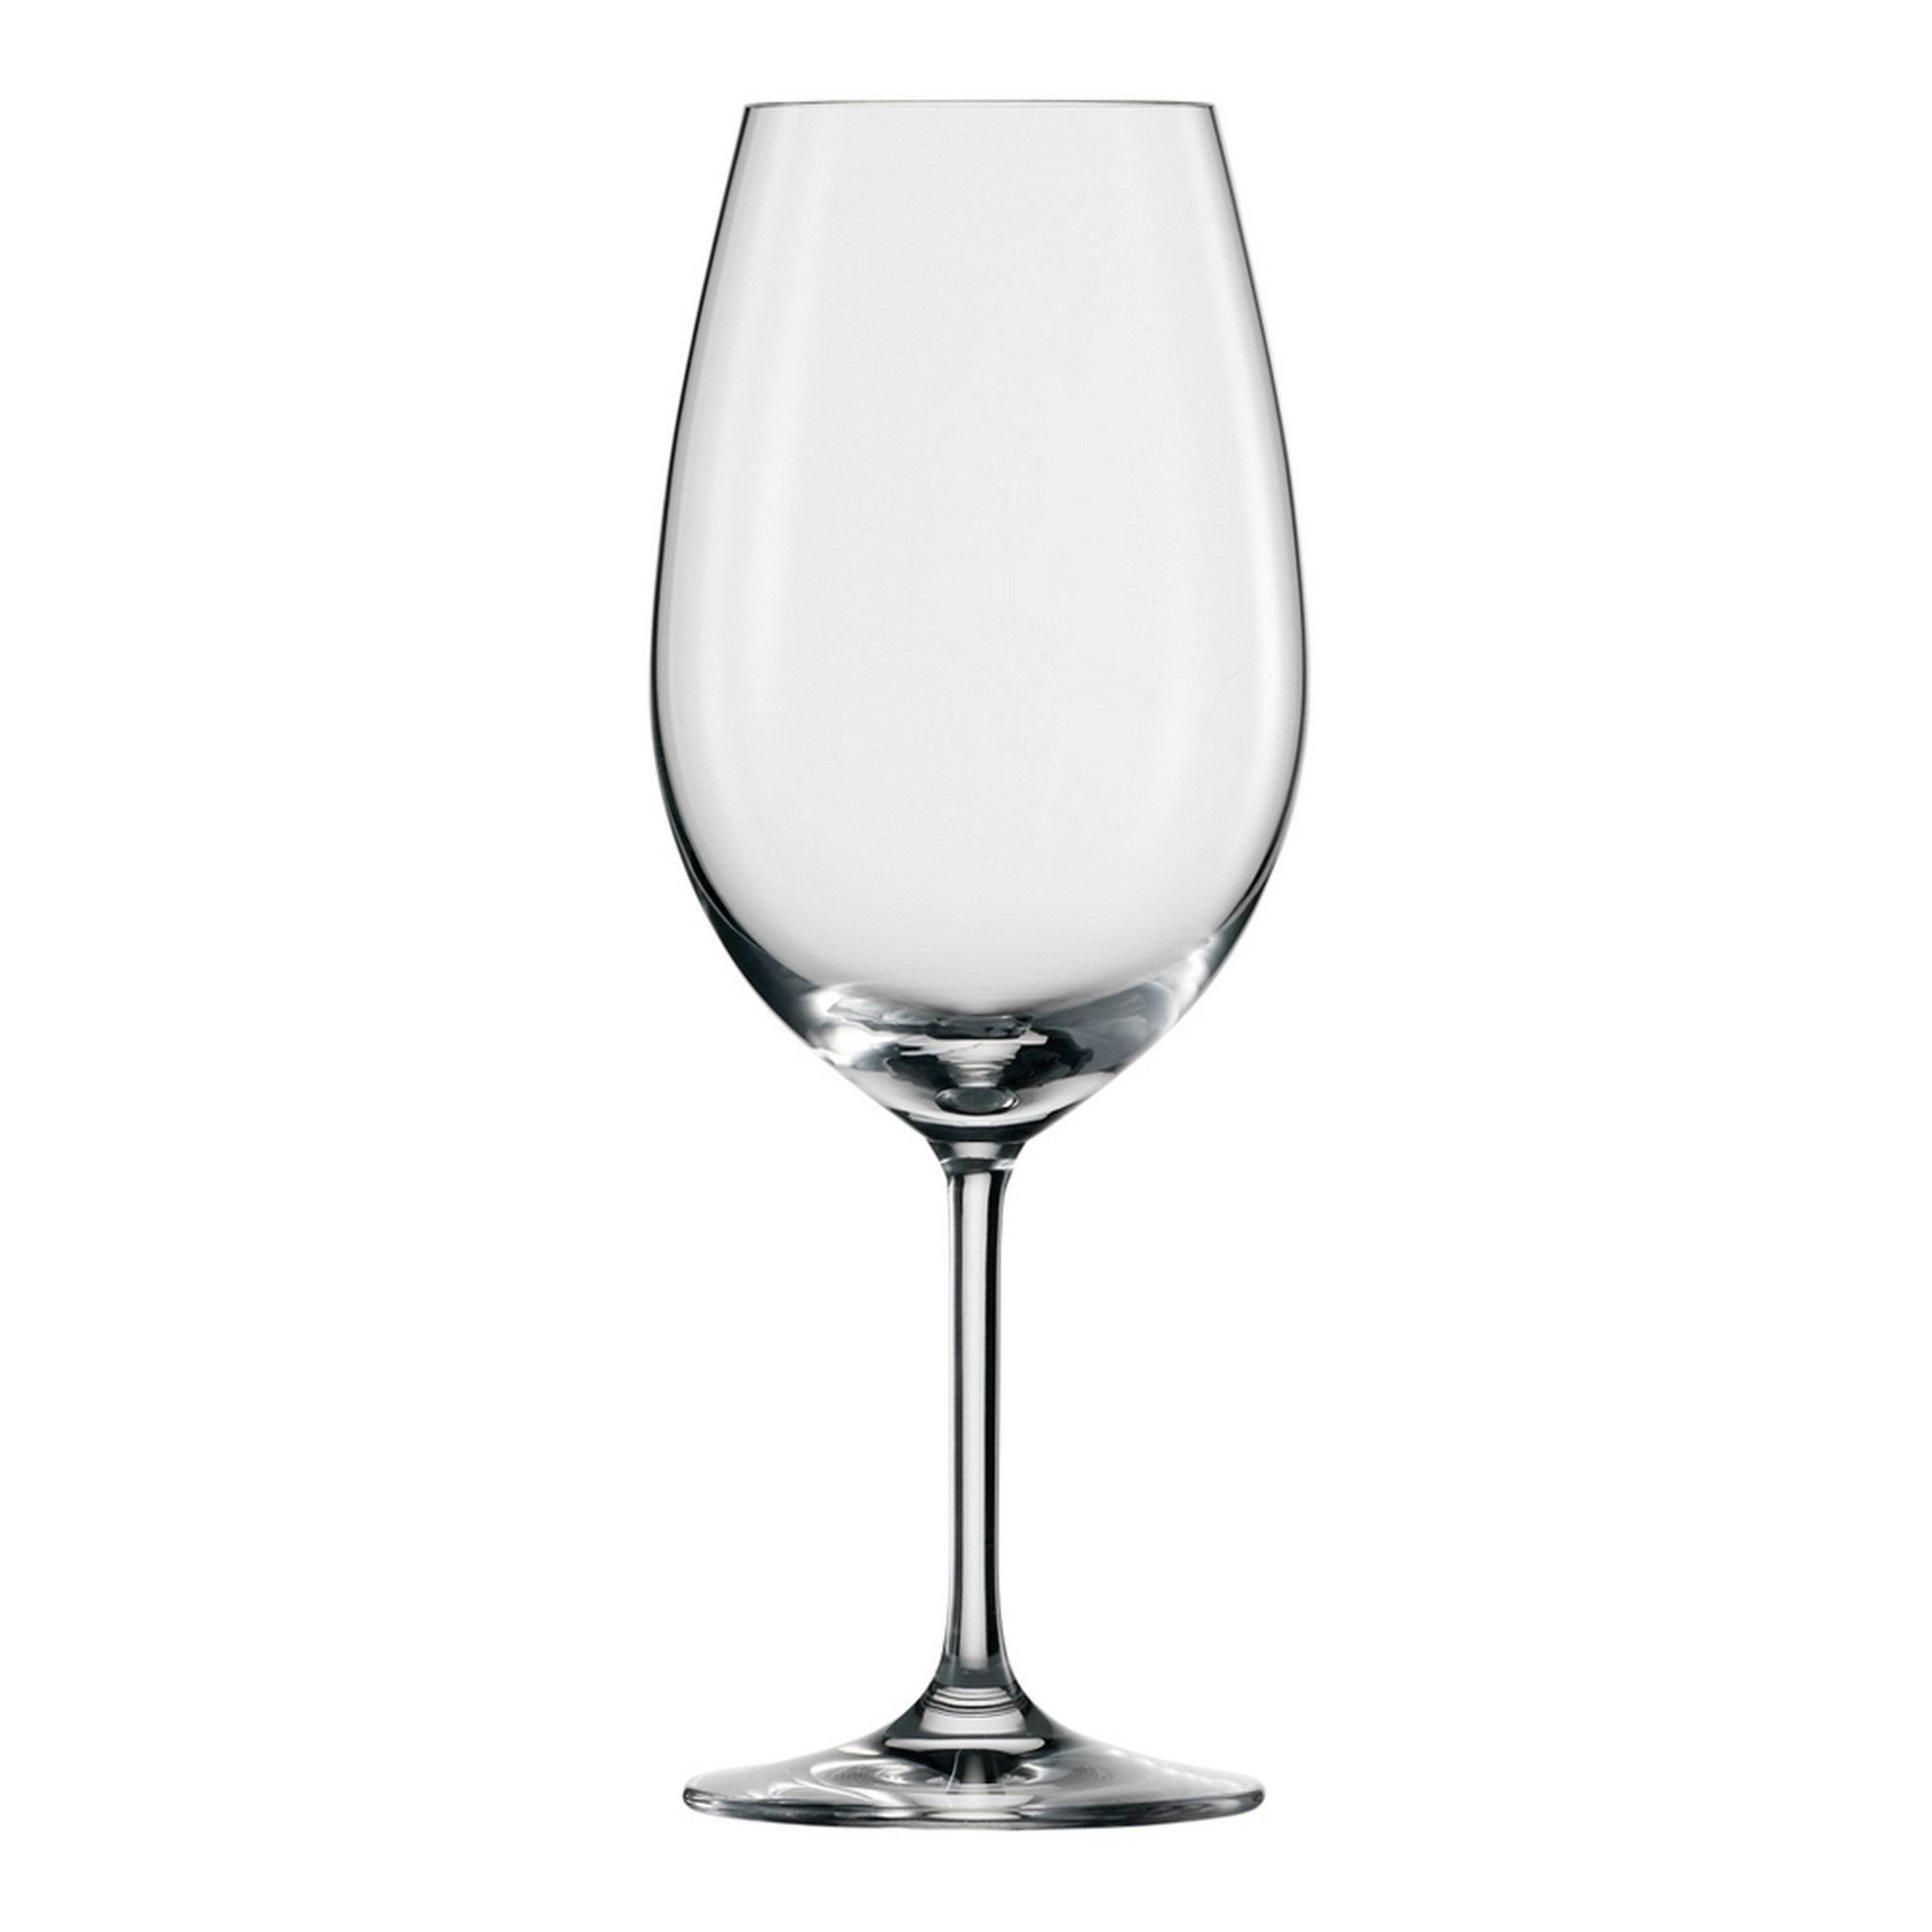 Taça para Bordeaux 633ml Schott Zwiesel Ivento 6 Peças de Cristal